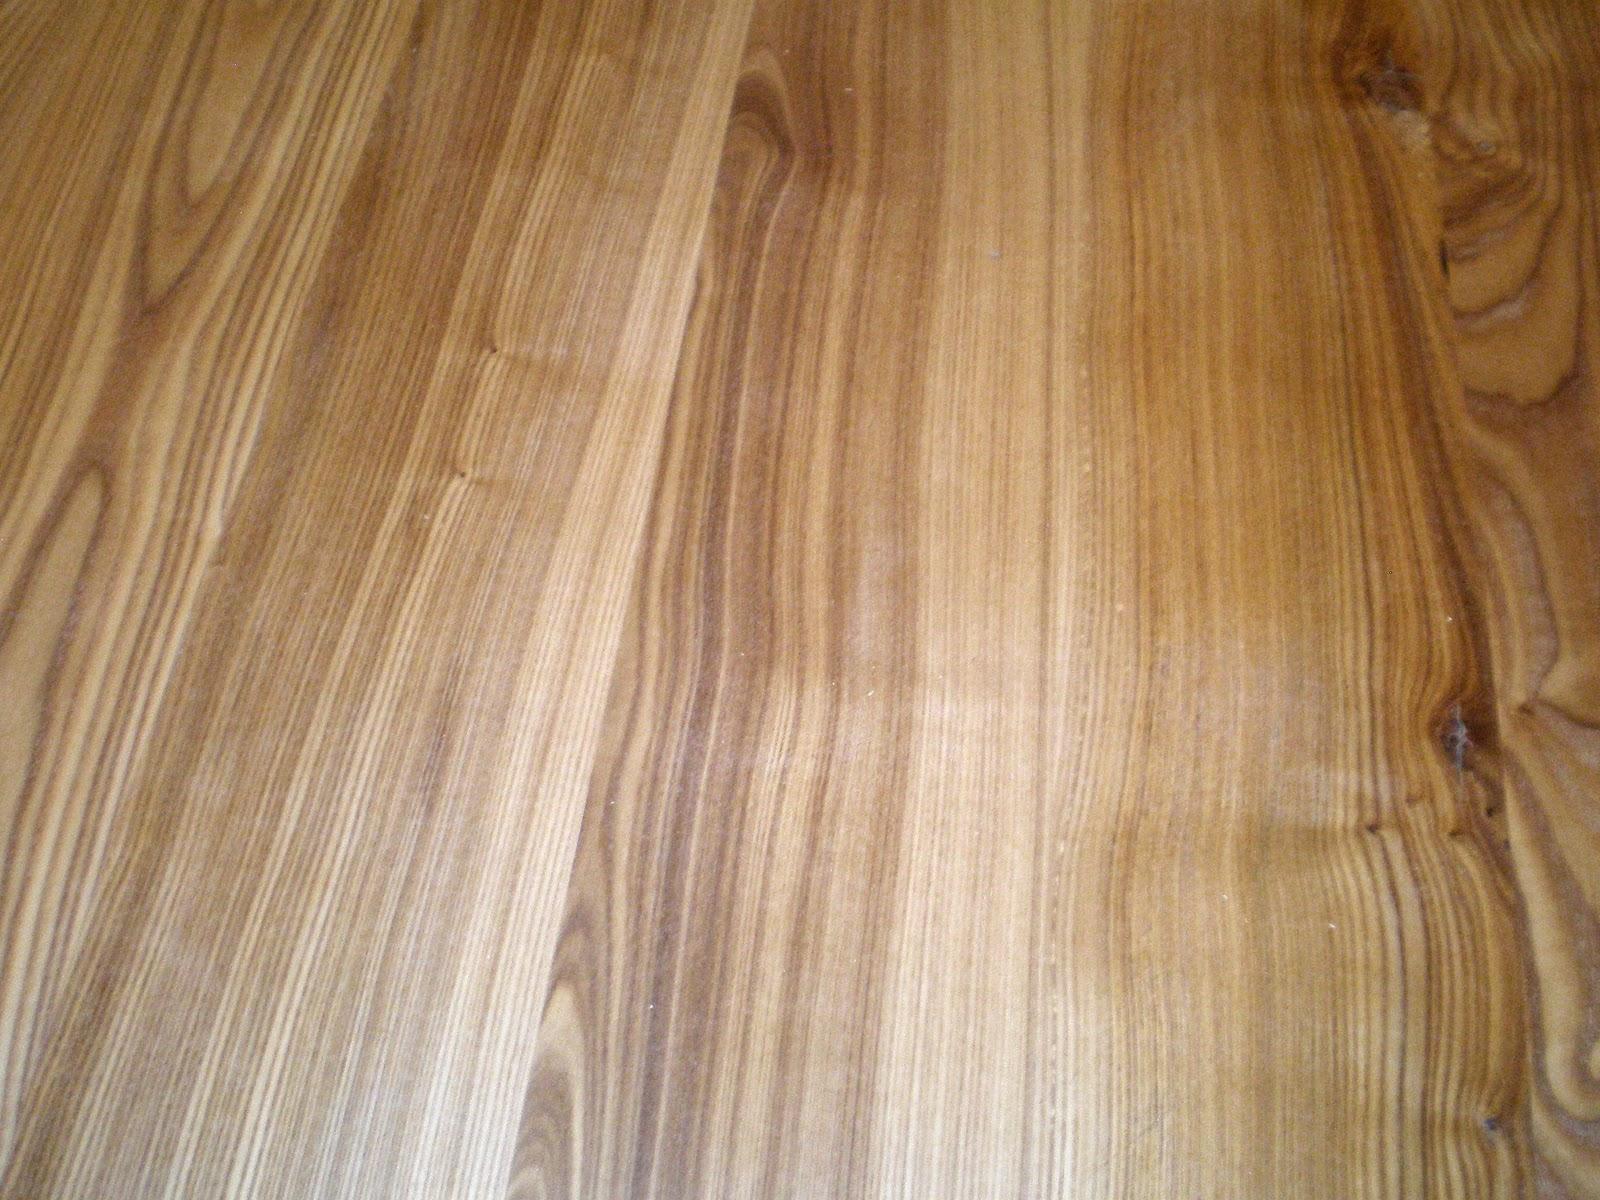 Ash hardwood flooring flooring ideas home for Parquet flooring